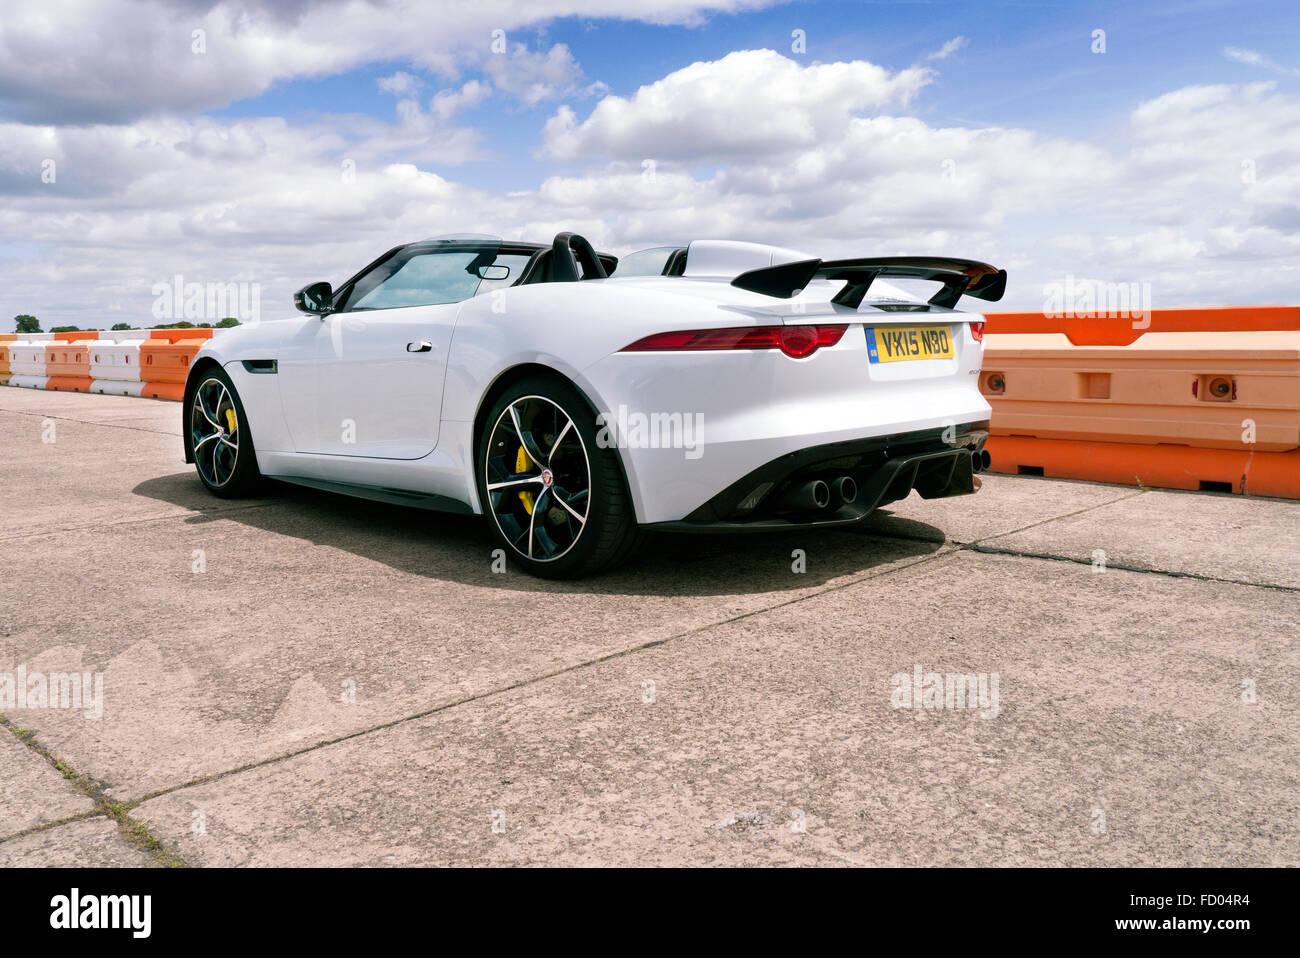 Jaguar Xkr Stock Photos & Jaguar Xkr Stock Images - Alamy